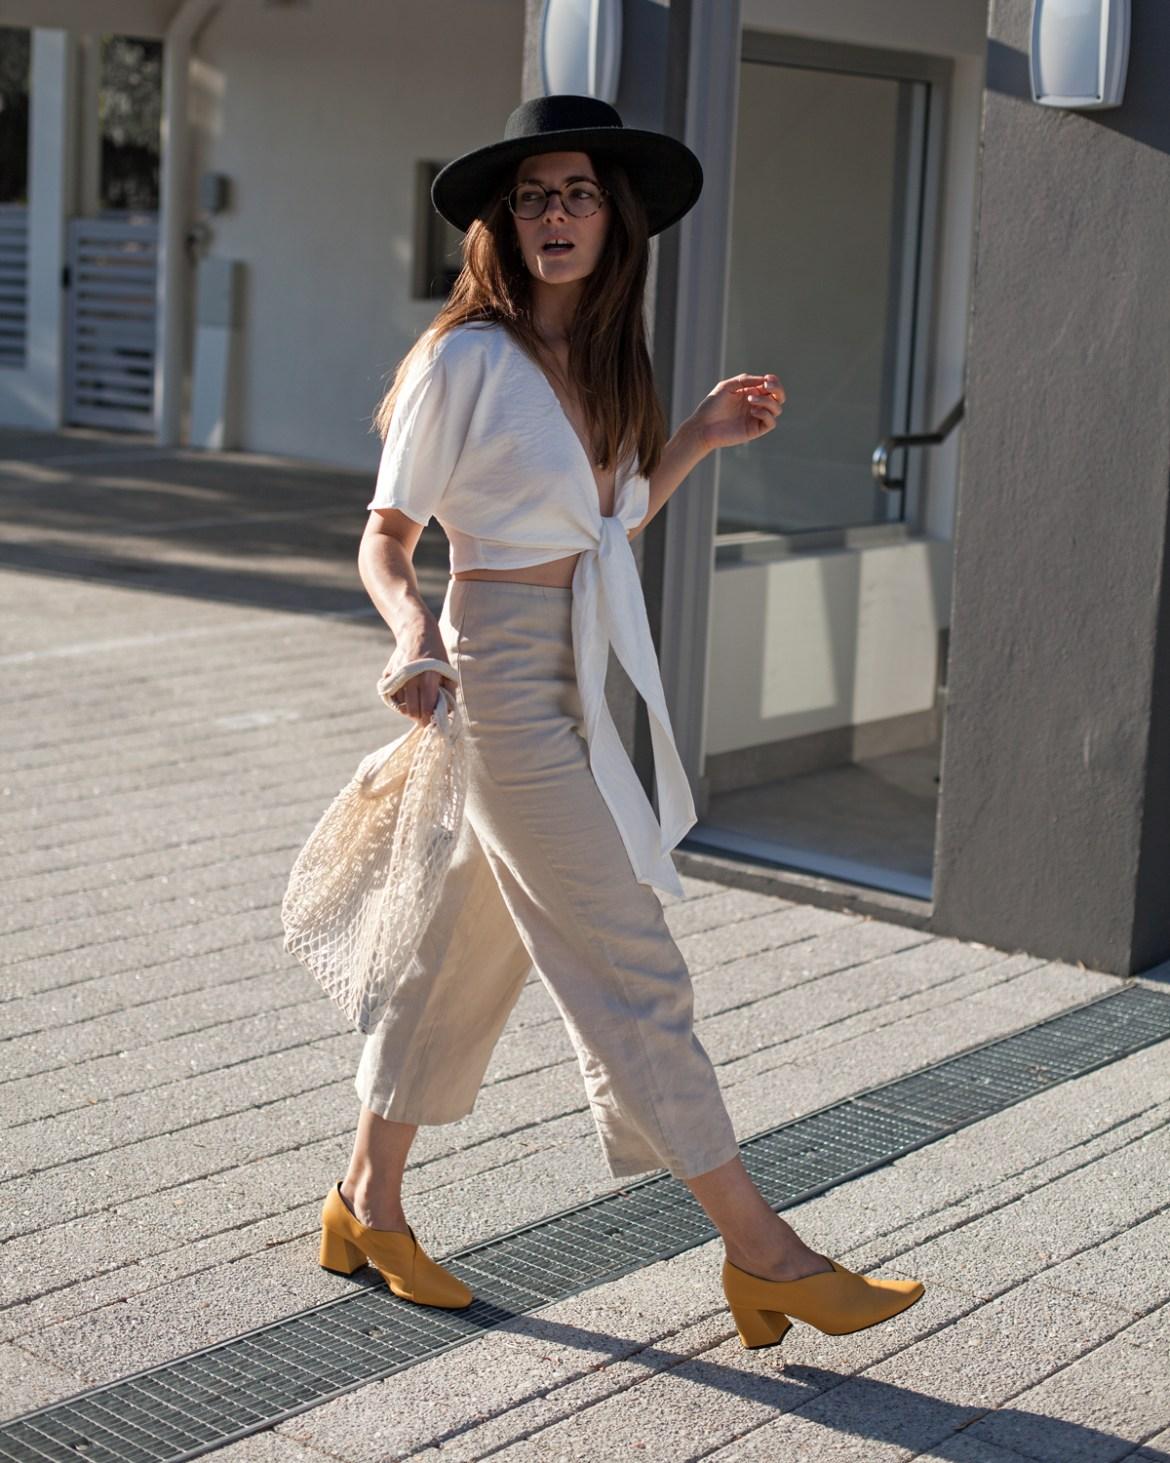 statement coloured pump heel EOD extraordinary ordinary day Tara pump heels in mustard worn Staple linen tie front top by Inspiring Wit blogger Jenelle